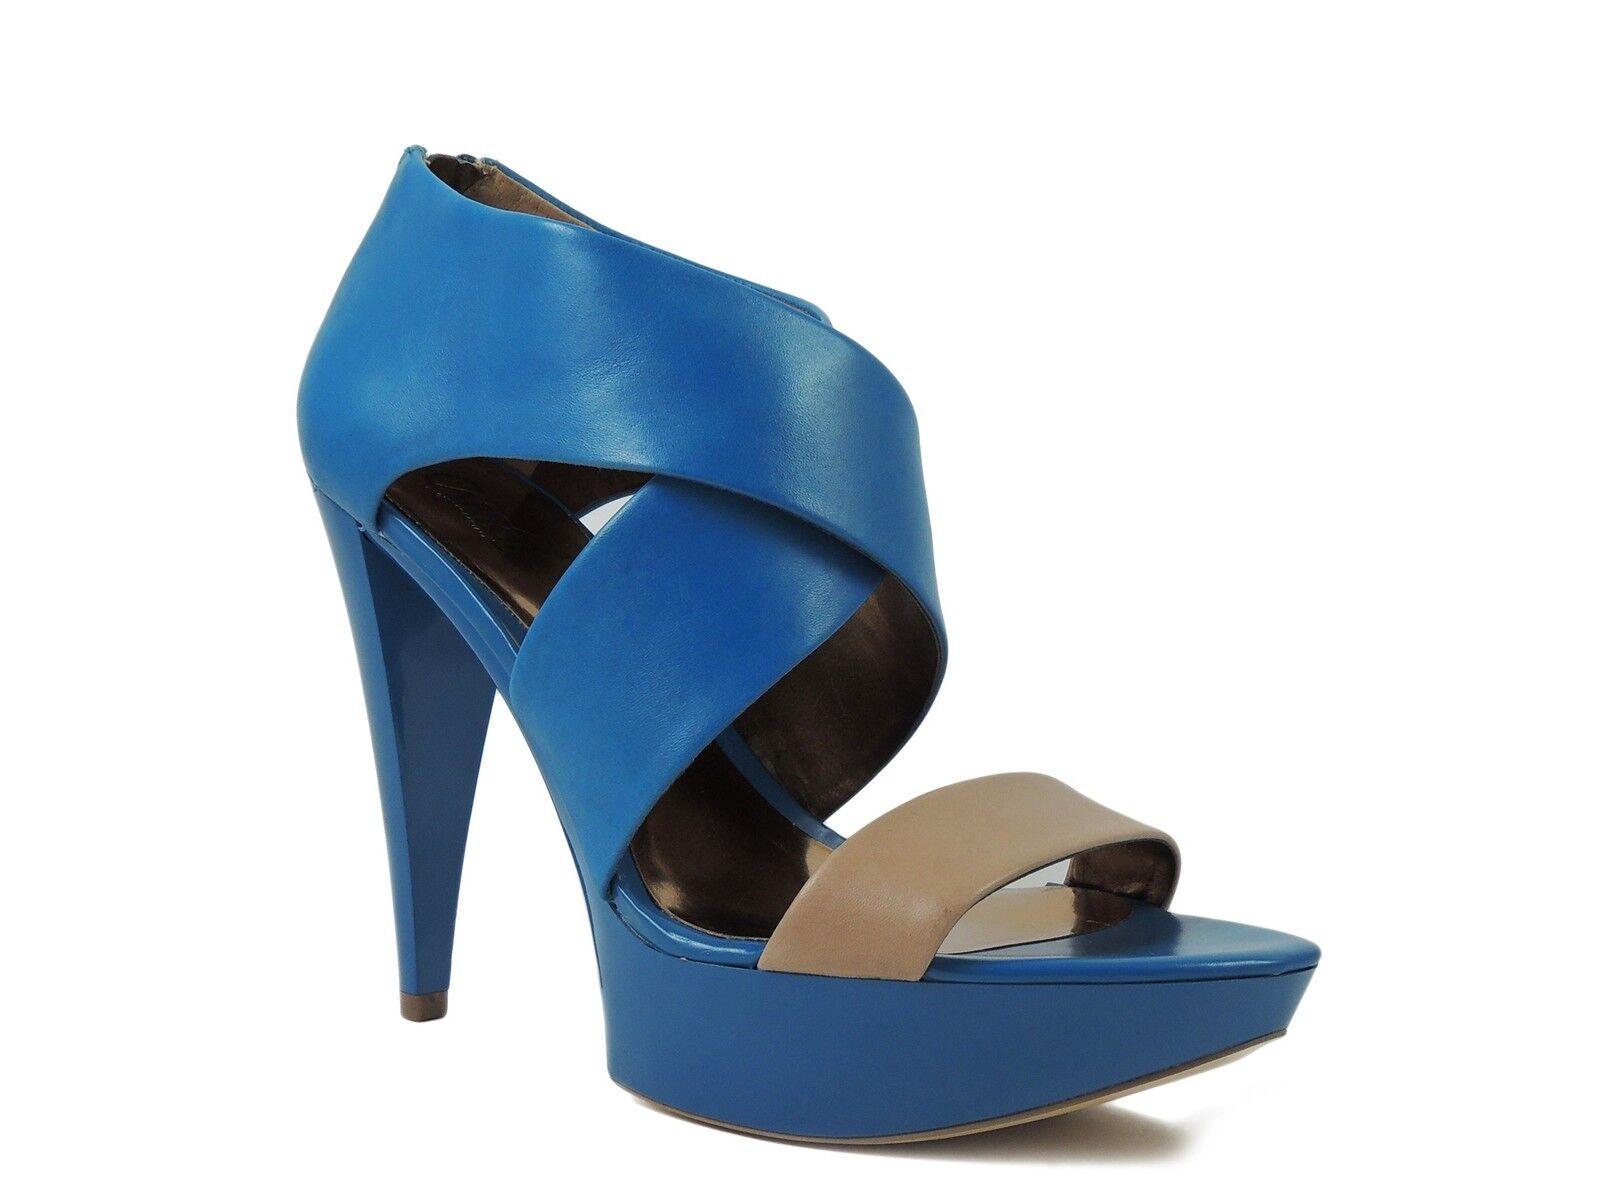 Carlos Santana Women's Mixer Open Toe Platform Sandals bluee Camel Size 8 M